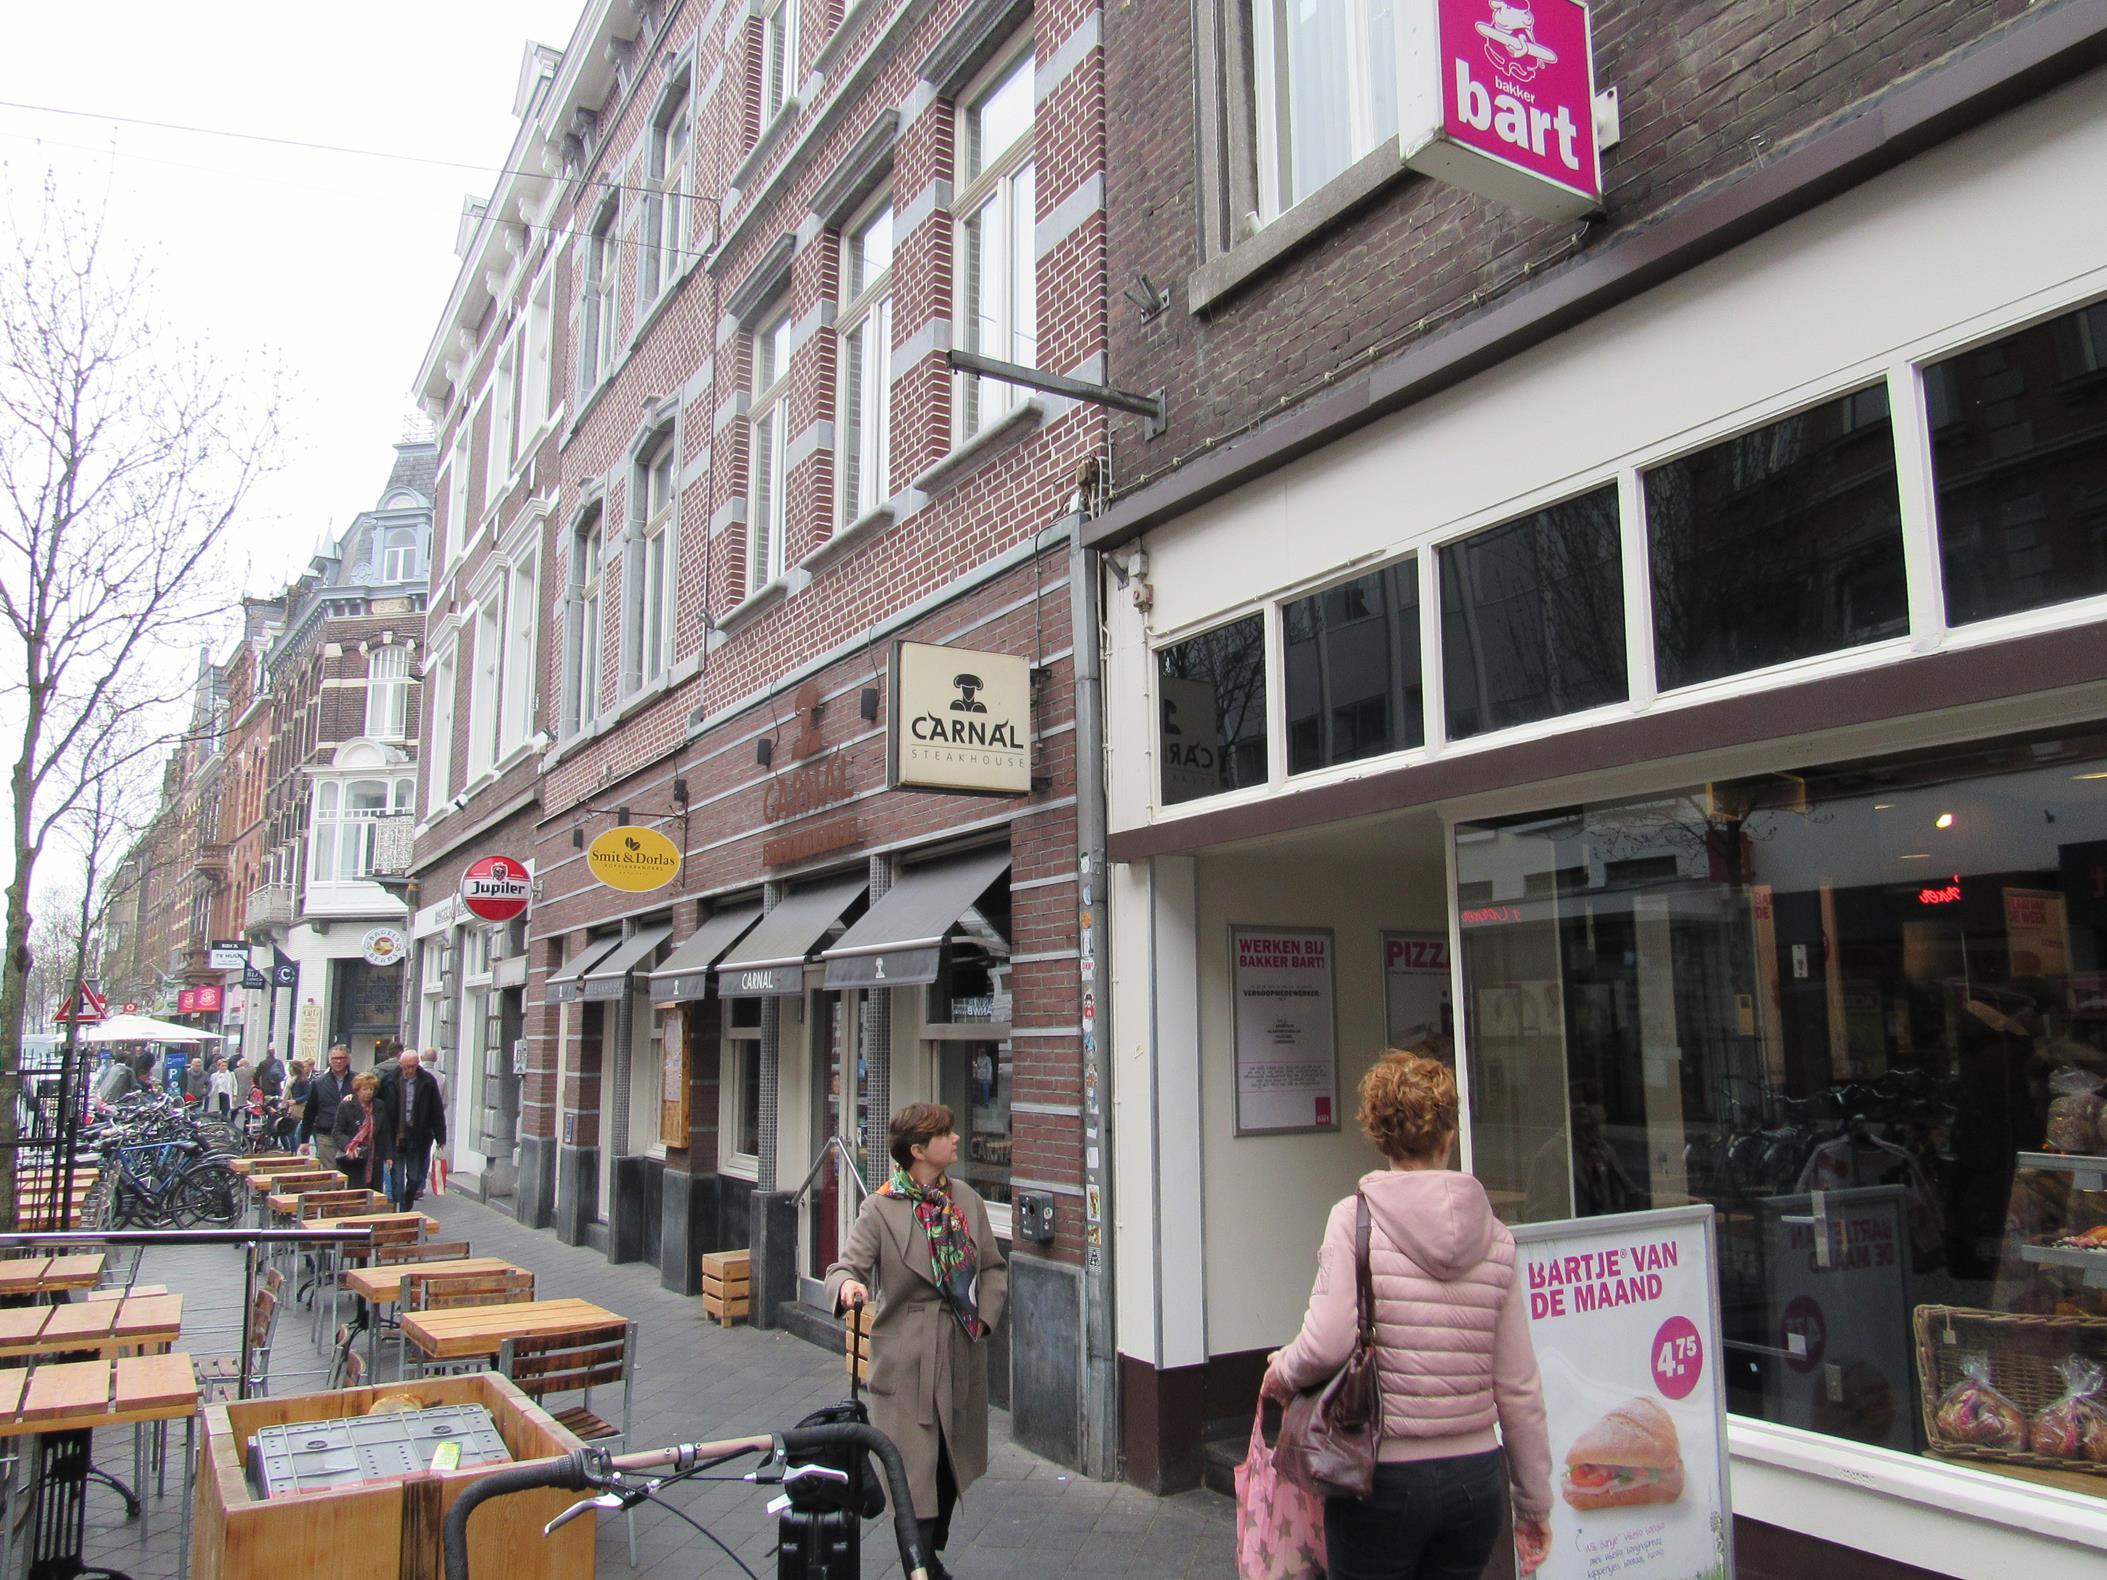 Wycker Brugstraat